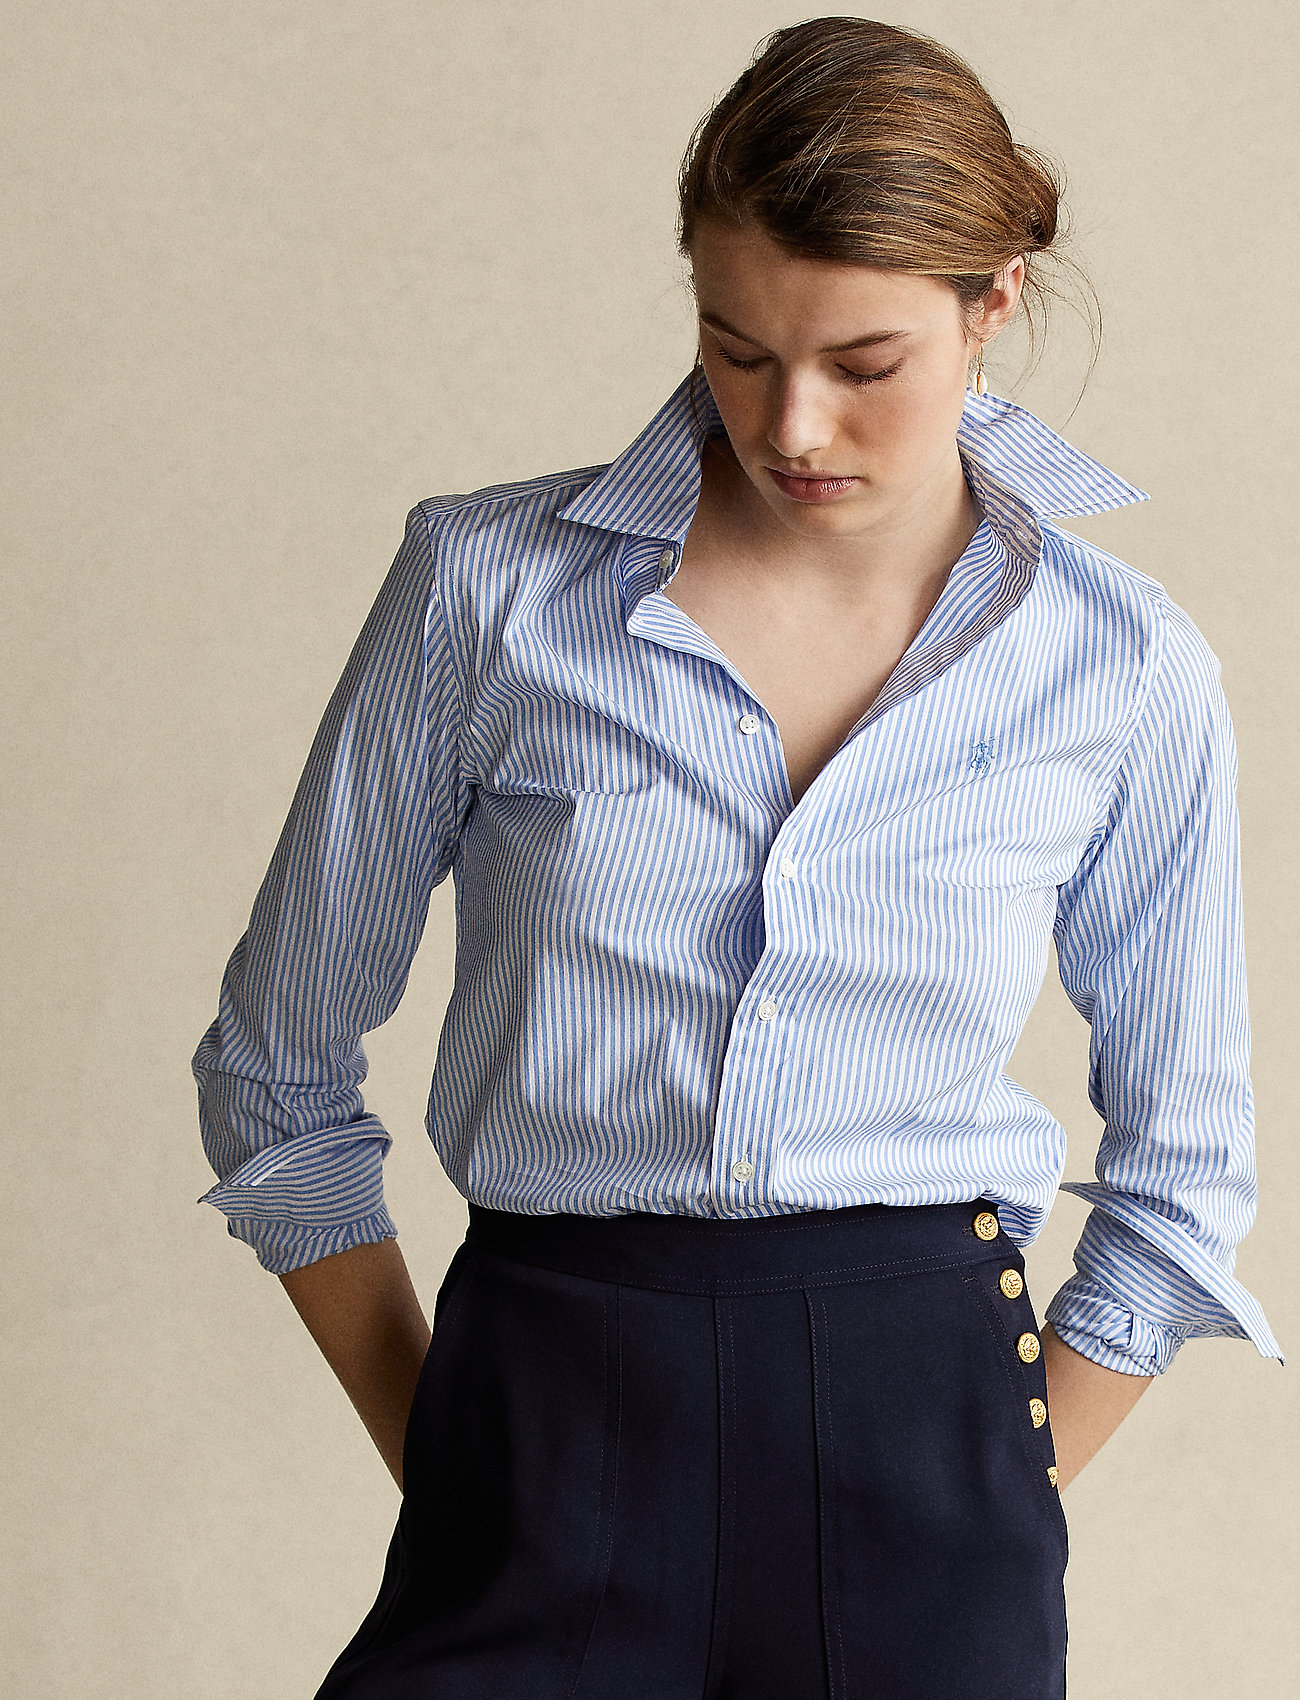 Polo Ralph Lauren - Striped Cotton Shirt - langærmede skjorter - 921a lt blue/whit - 0